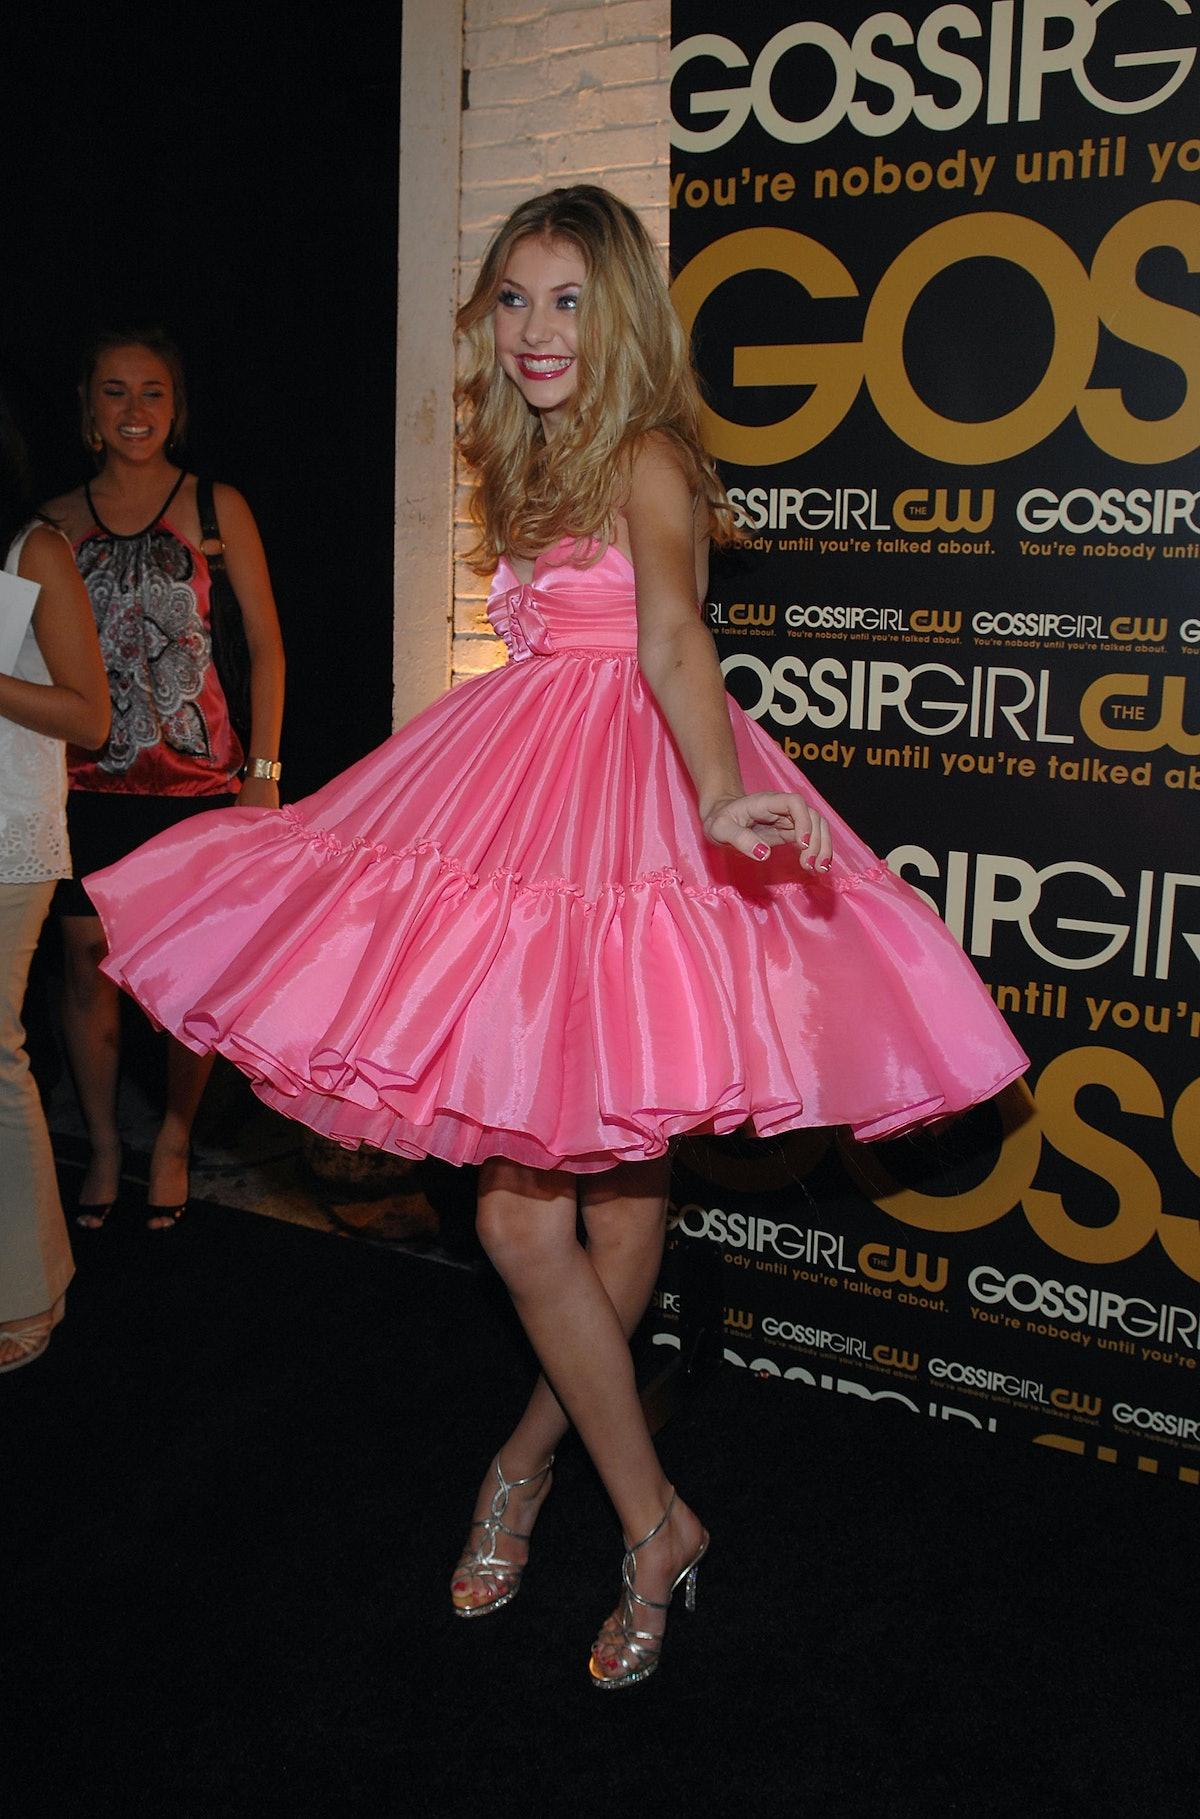 Taylor Momson in pink dress.